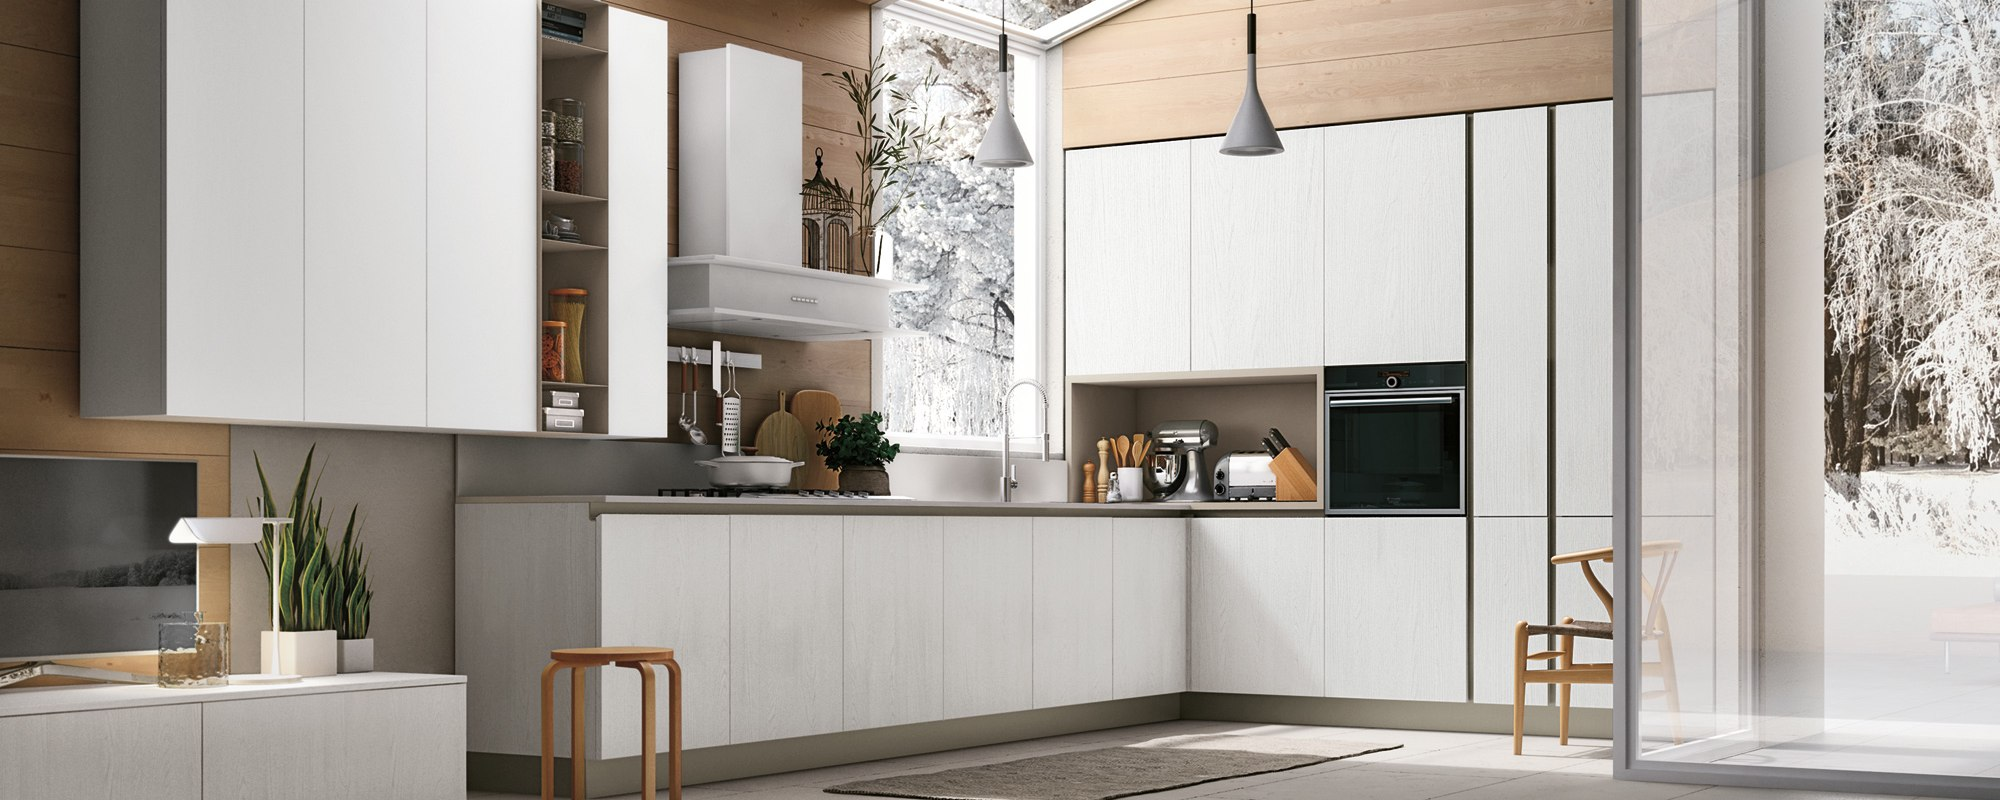 Stosa infinity mobili gala - Cucine artigianali palermo ...